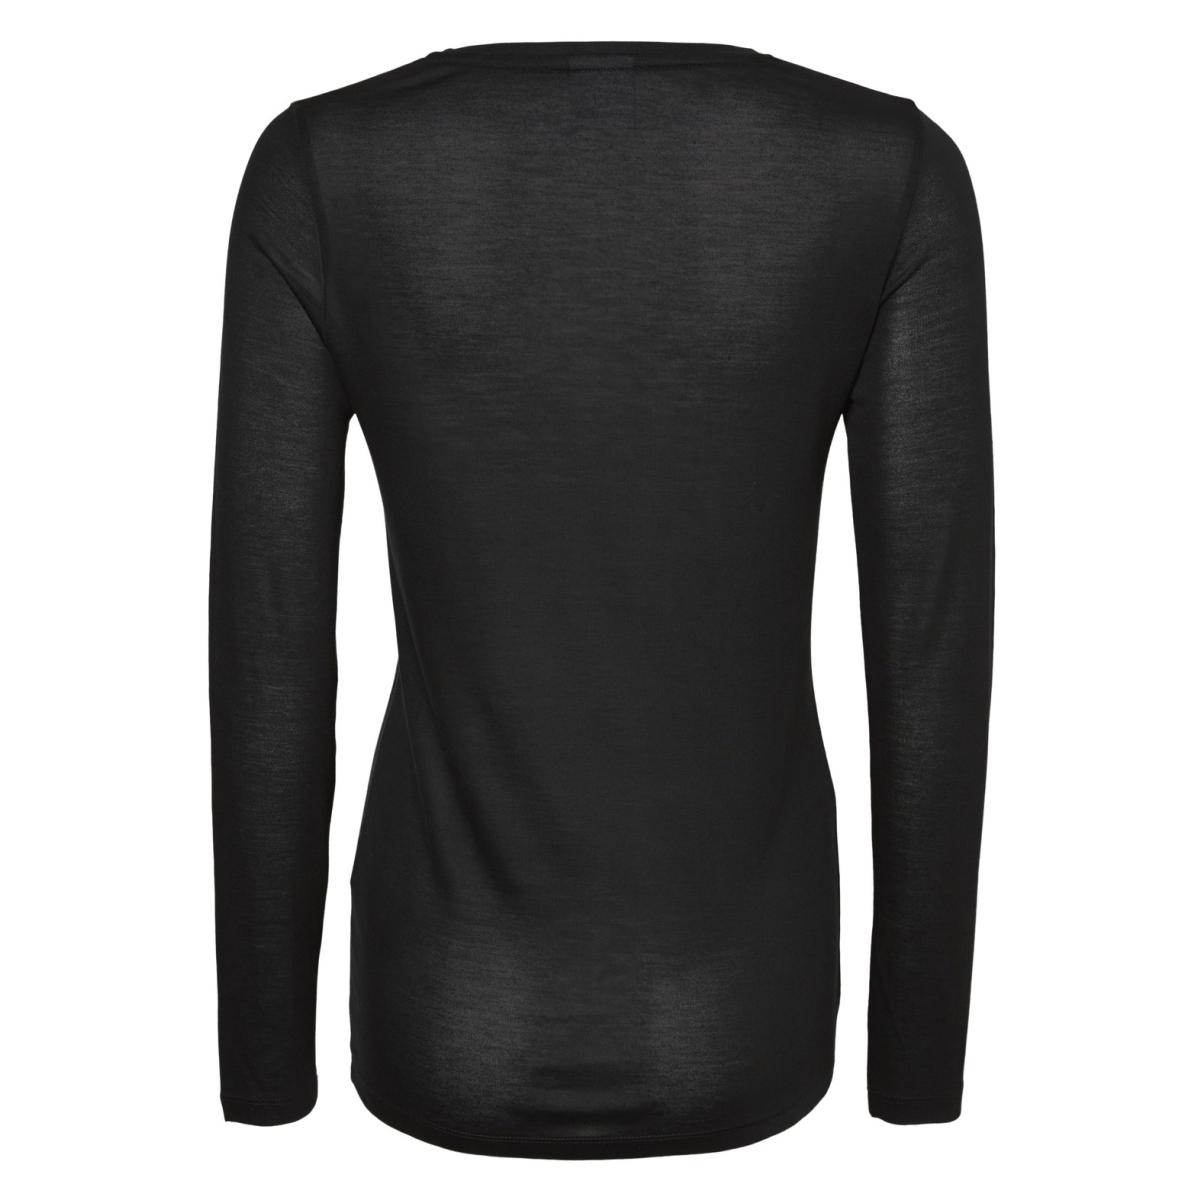 mlelysa l/s jersey top a 20007746 mama-licious positie shirt black/frontprint